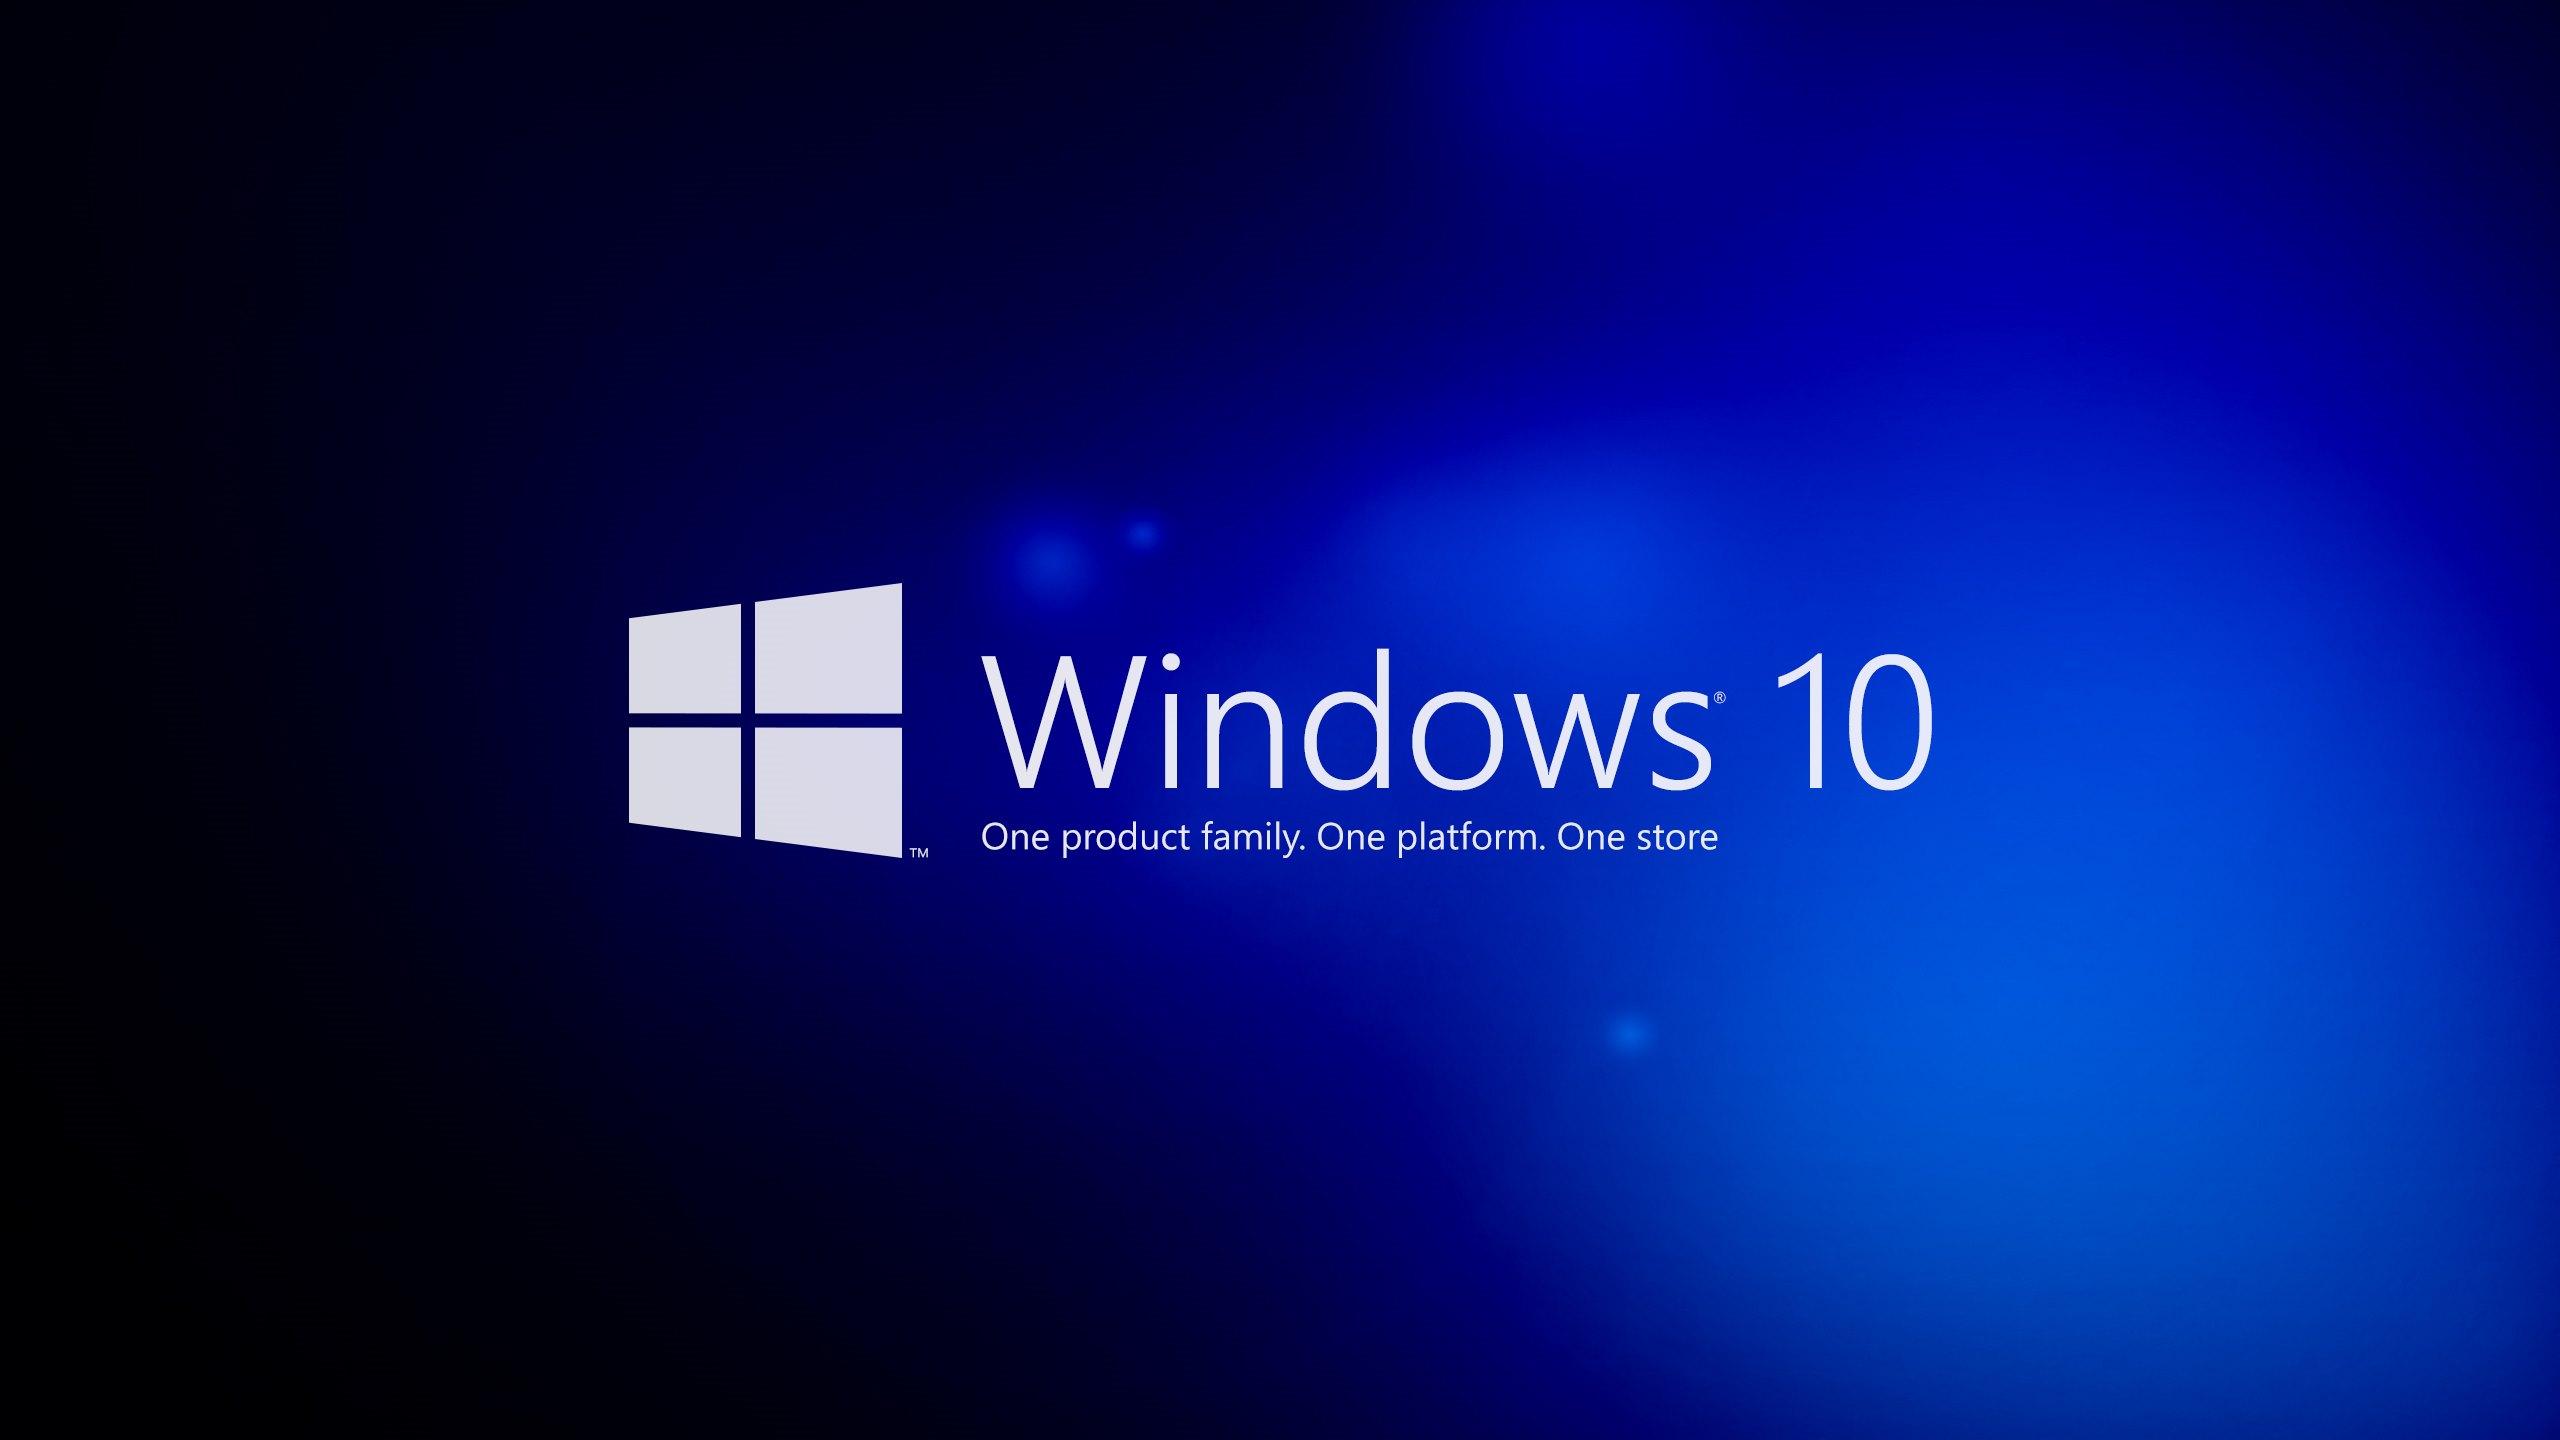 Widescreen hd windows 10 wallpaper wallpapersafari - Windows 8 1 wallpaper hd nature ...